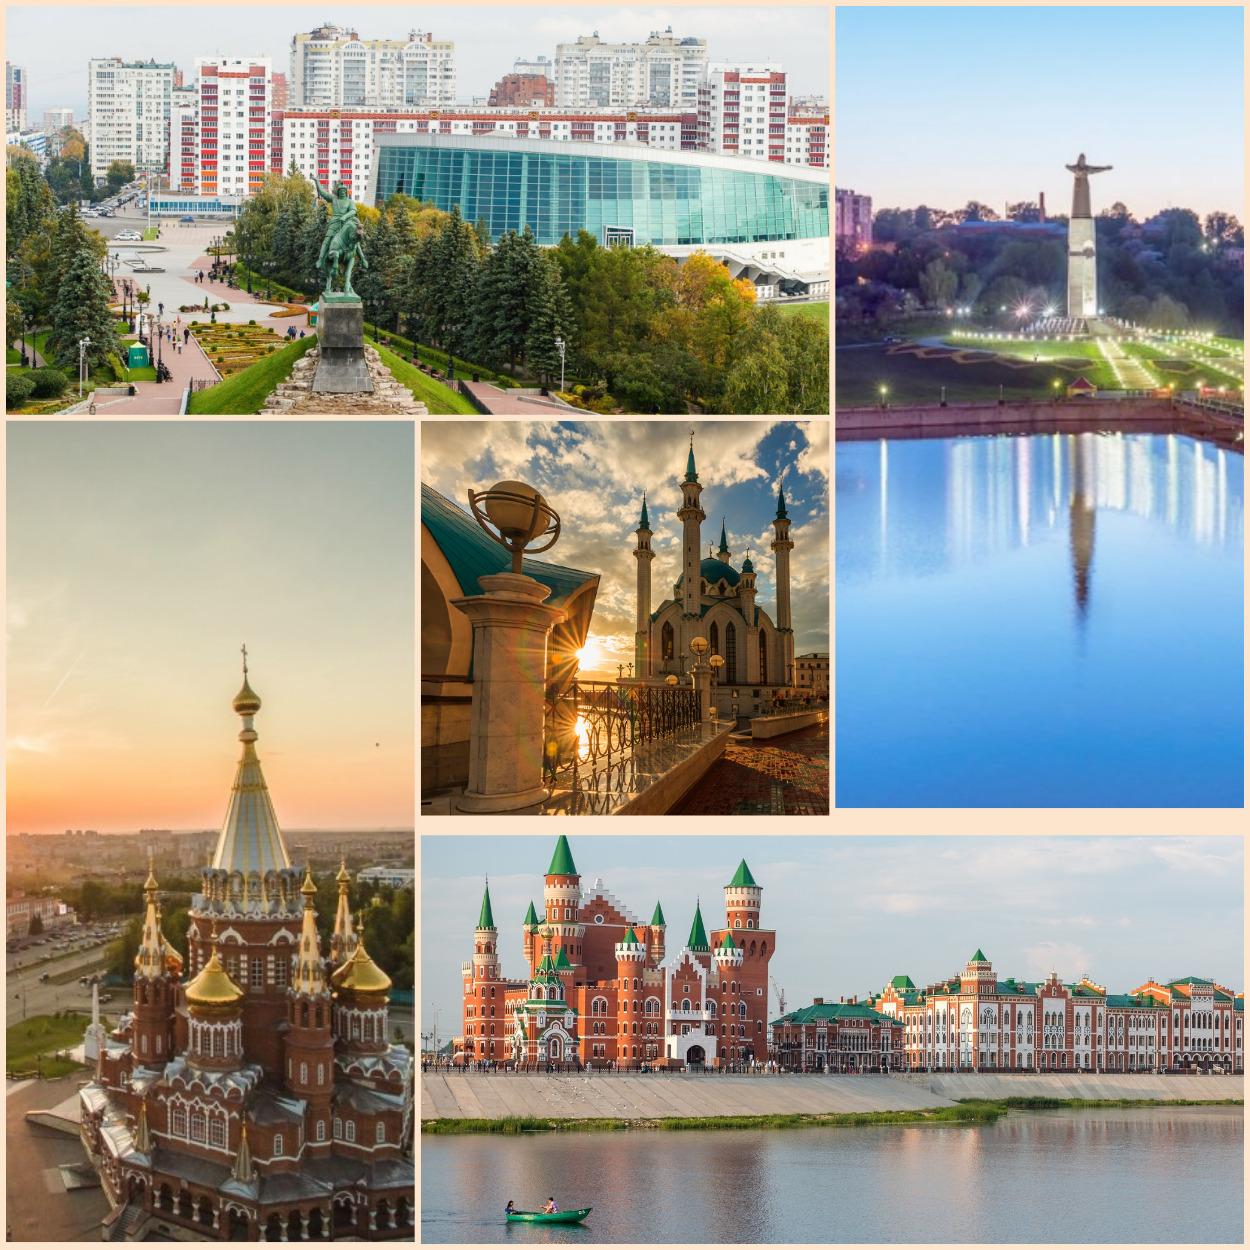 tur v rossiju loo 5 224 rub chel - Тур в Россию Лоо 5 224 руб. чел.